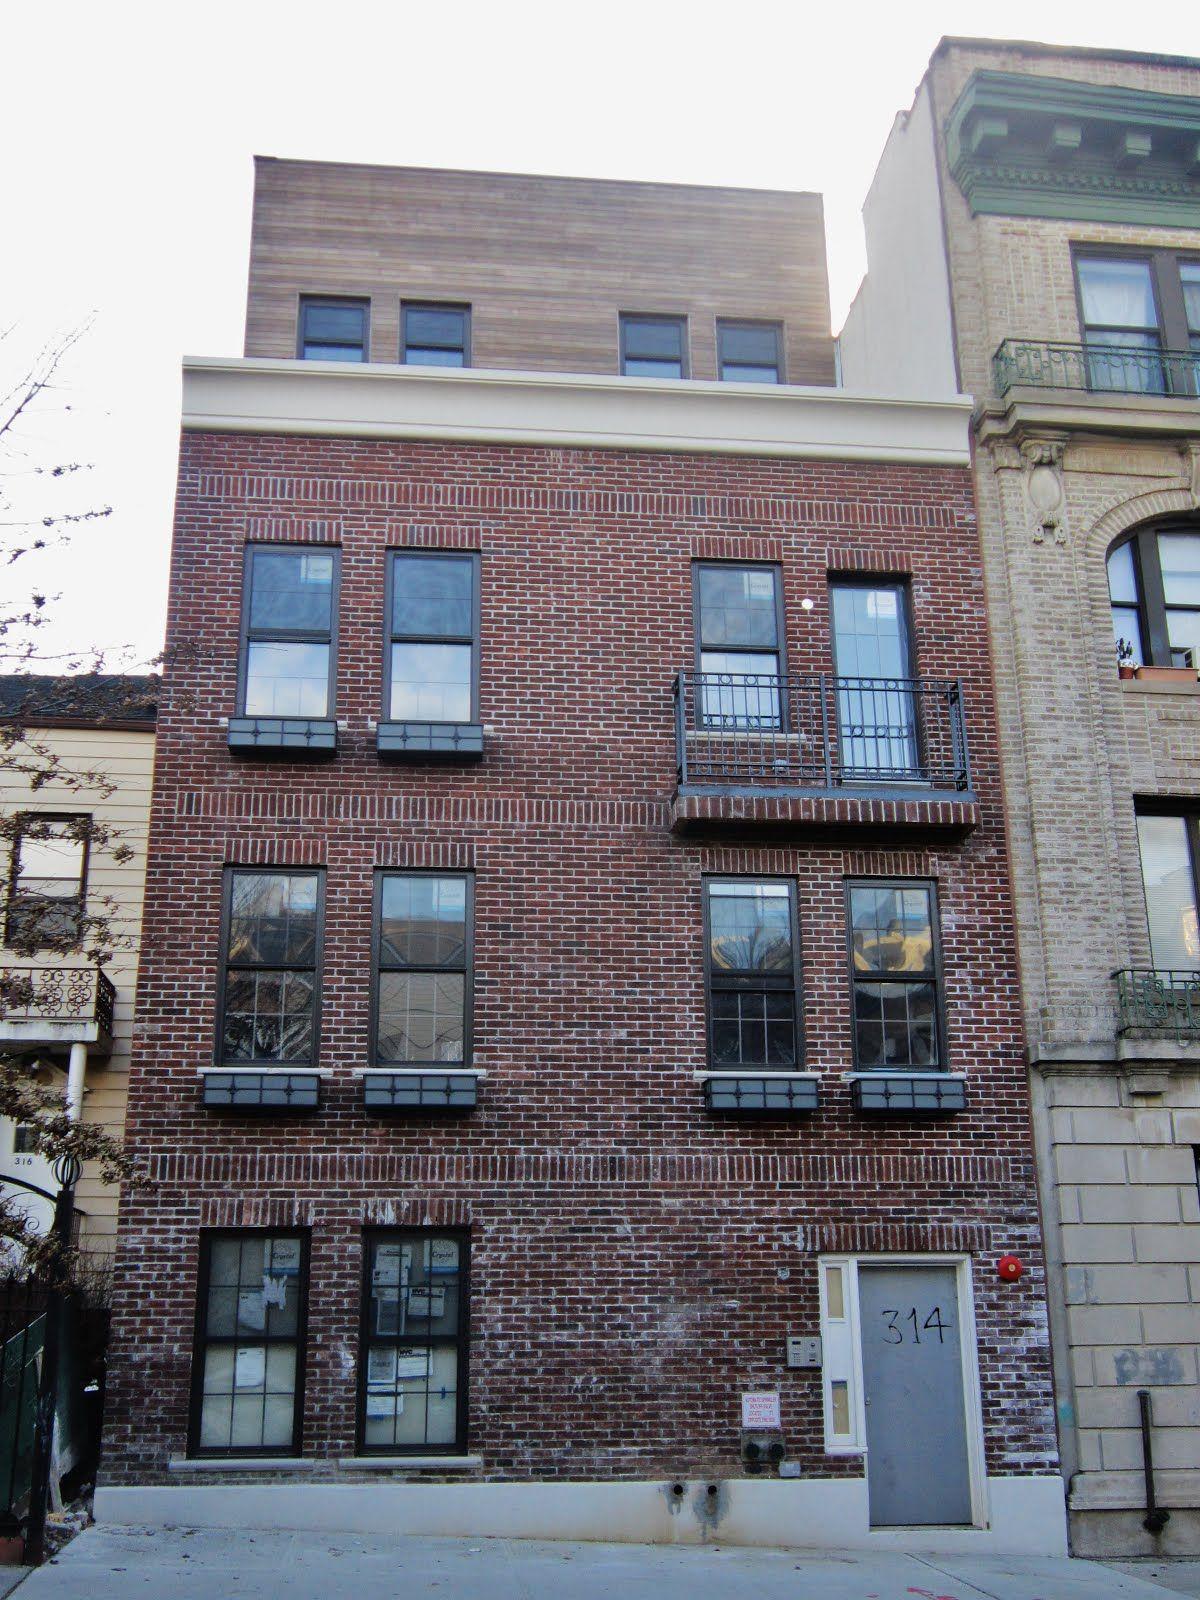 painted brick exterior apartment building - Google Search ... Brick Apartment Building